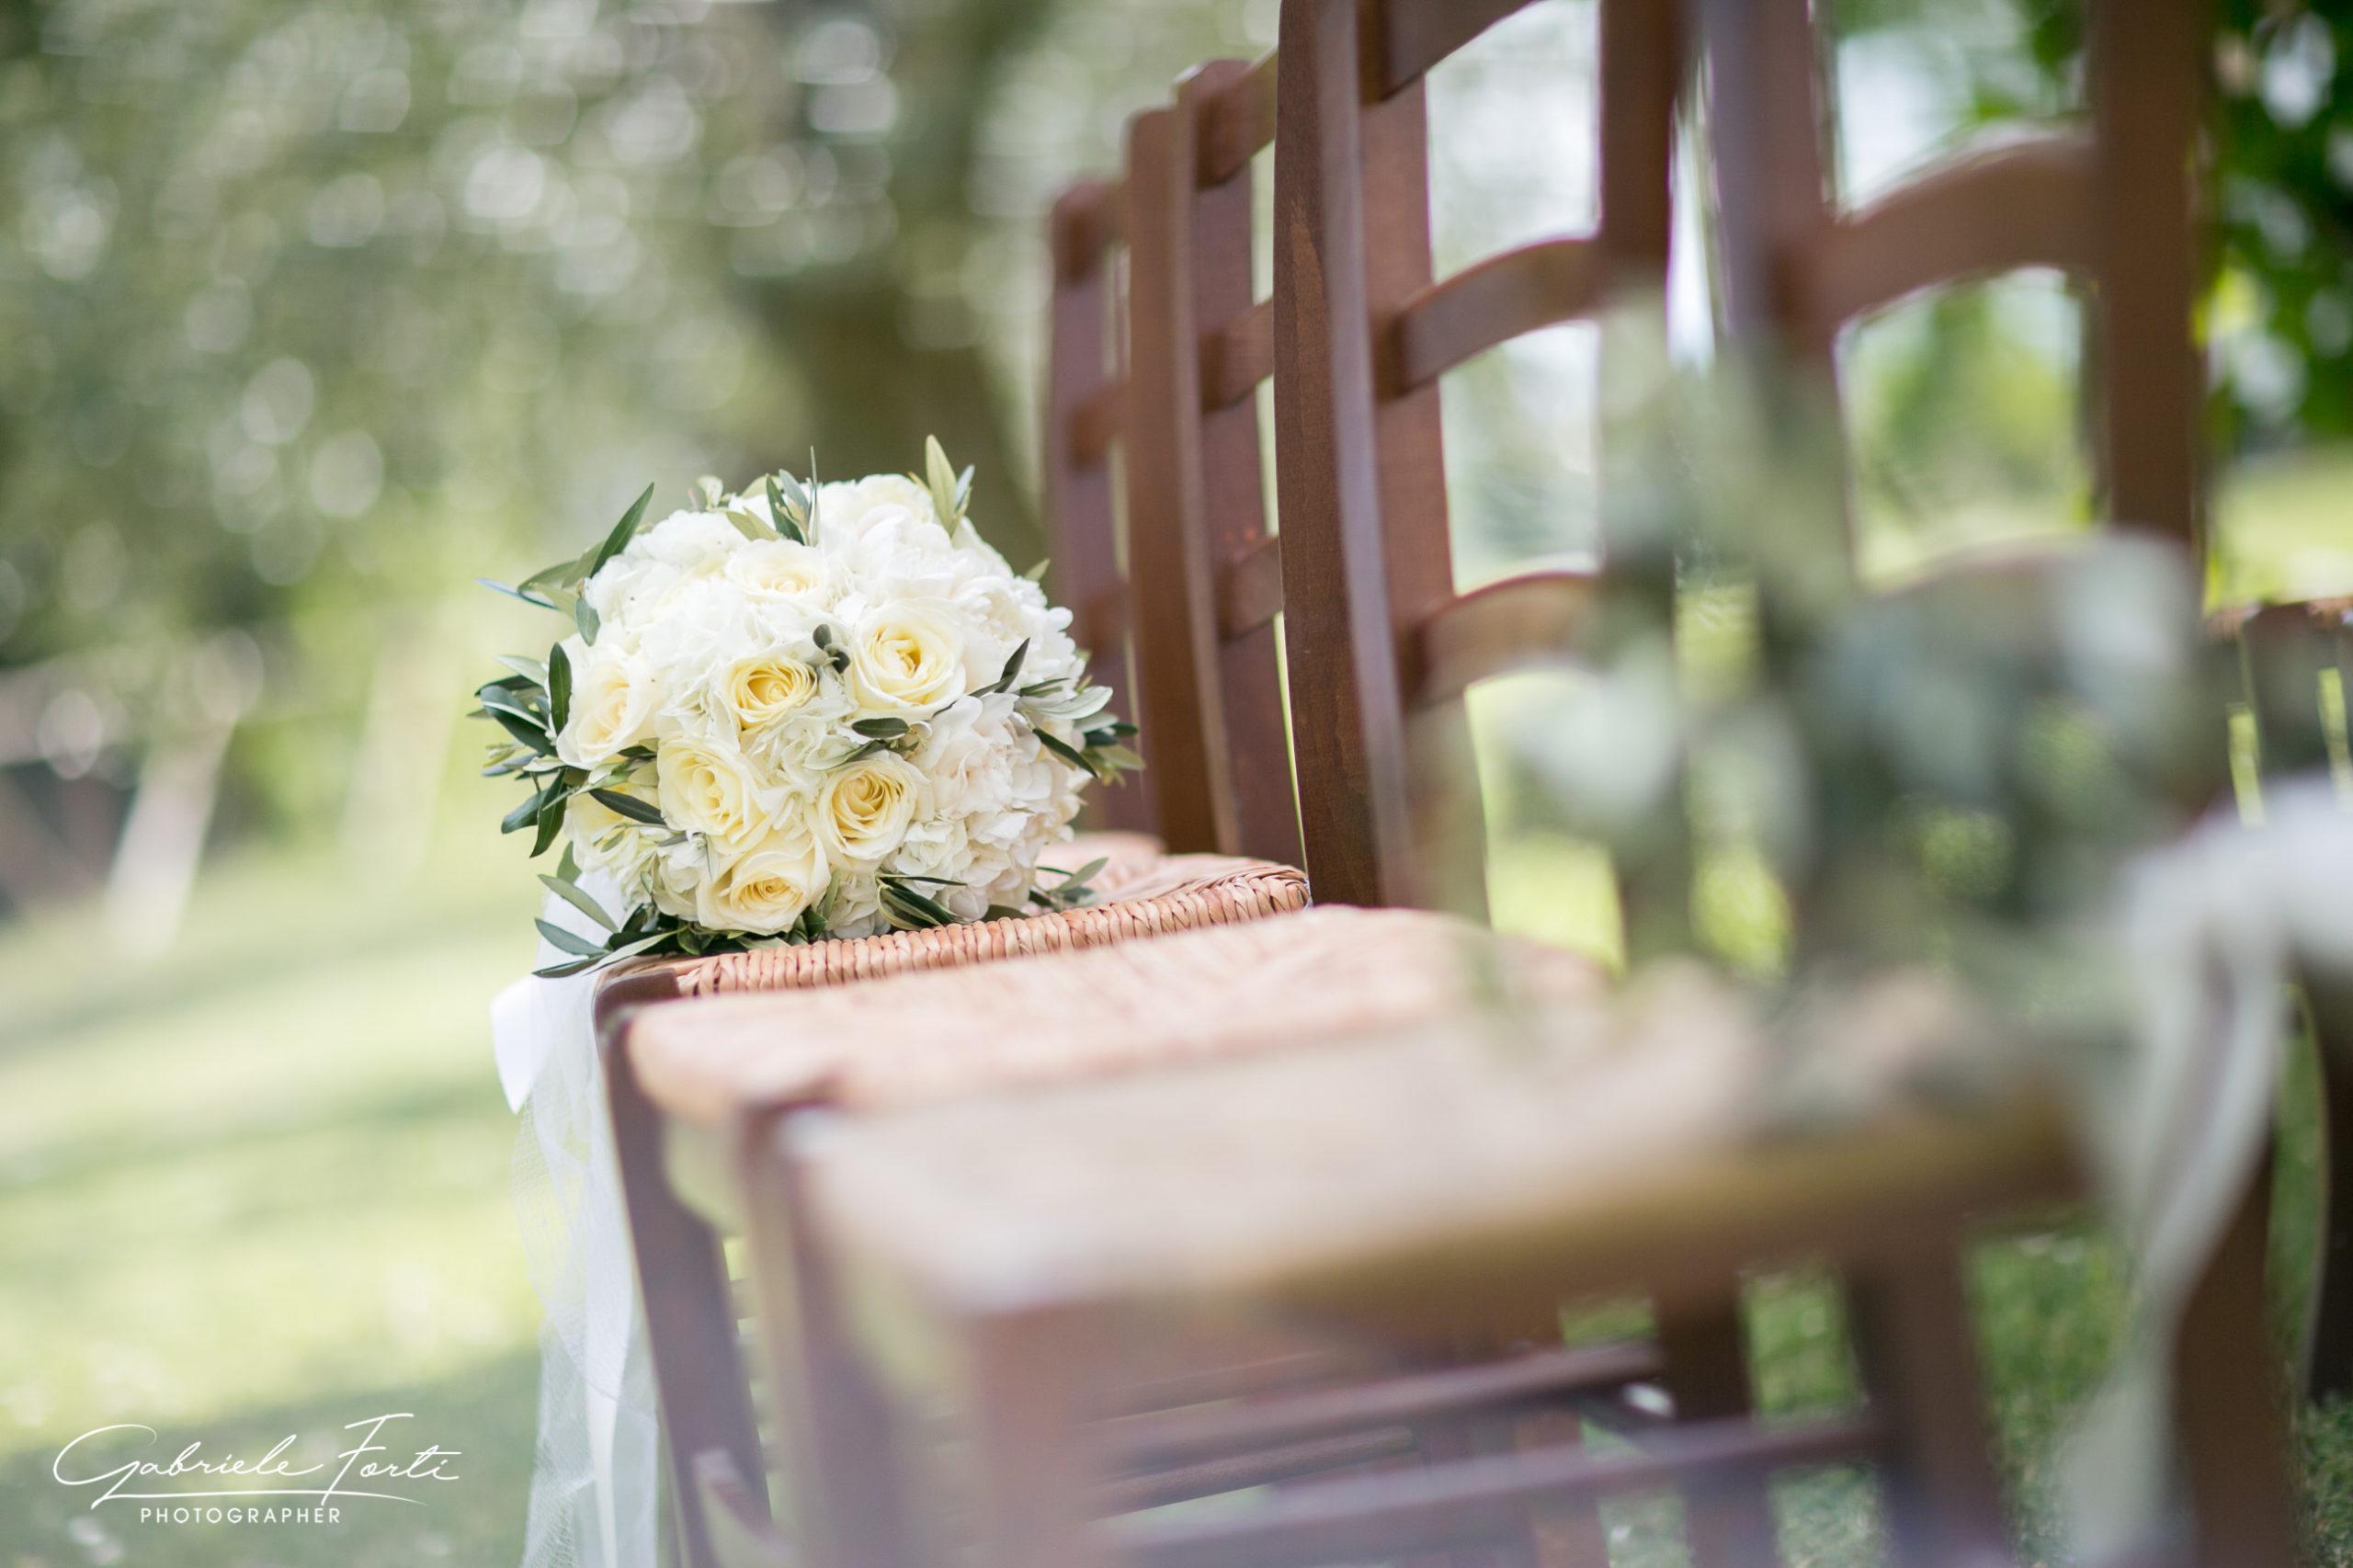 mazzolino-sposa-wedding-tuscany-photographer-foto-forti-gabriele